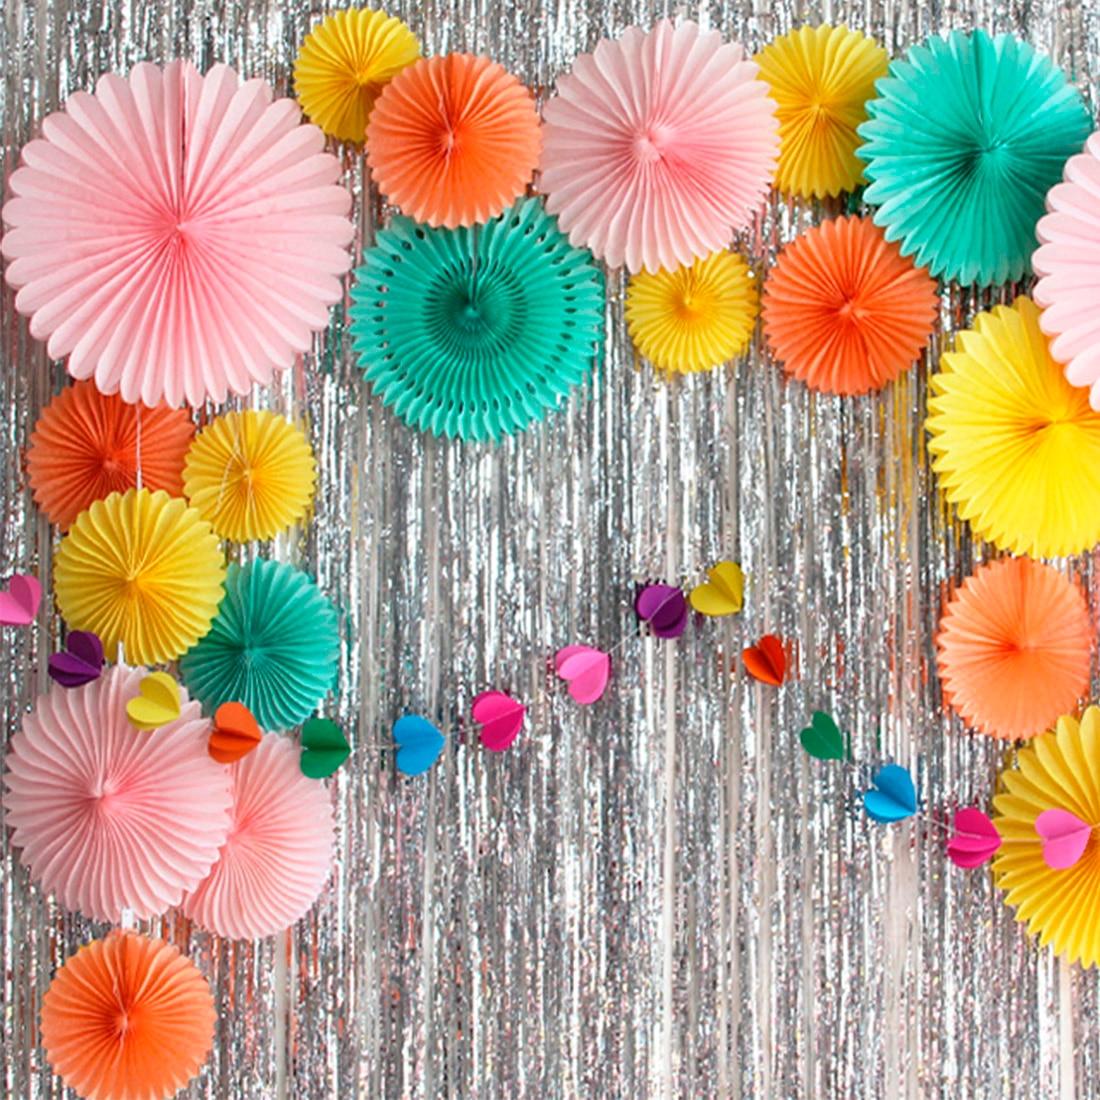 New 5pcs Tissue Paper Fan Diy Crafts Hanging Wedding: 15cm 30cm Tissue Paper Cut Out Paper Fans Pinwheels